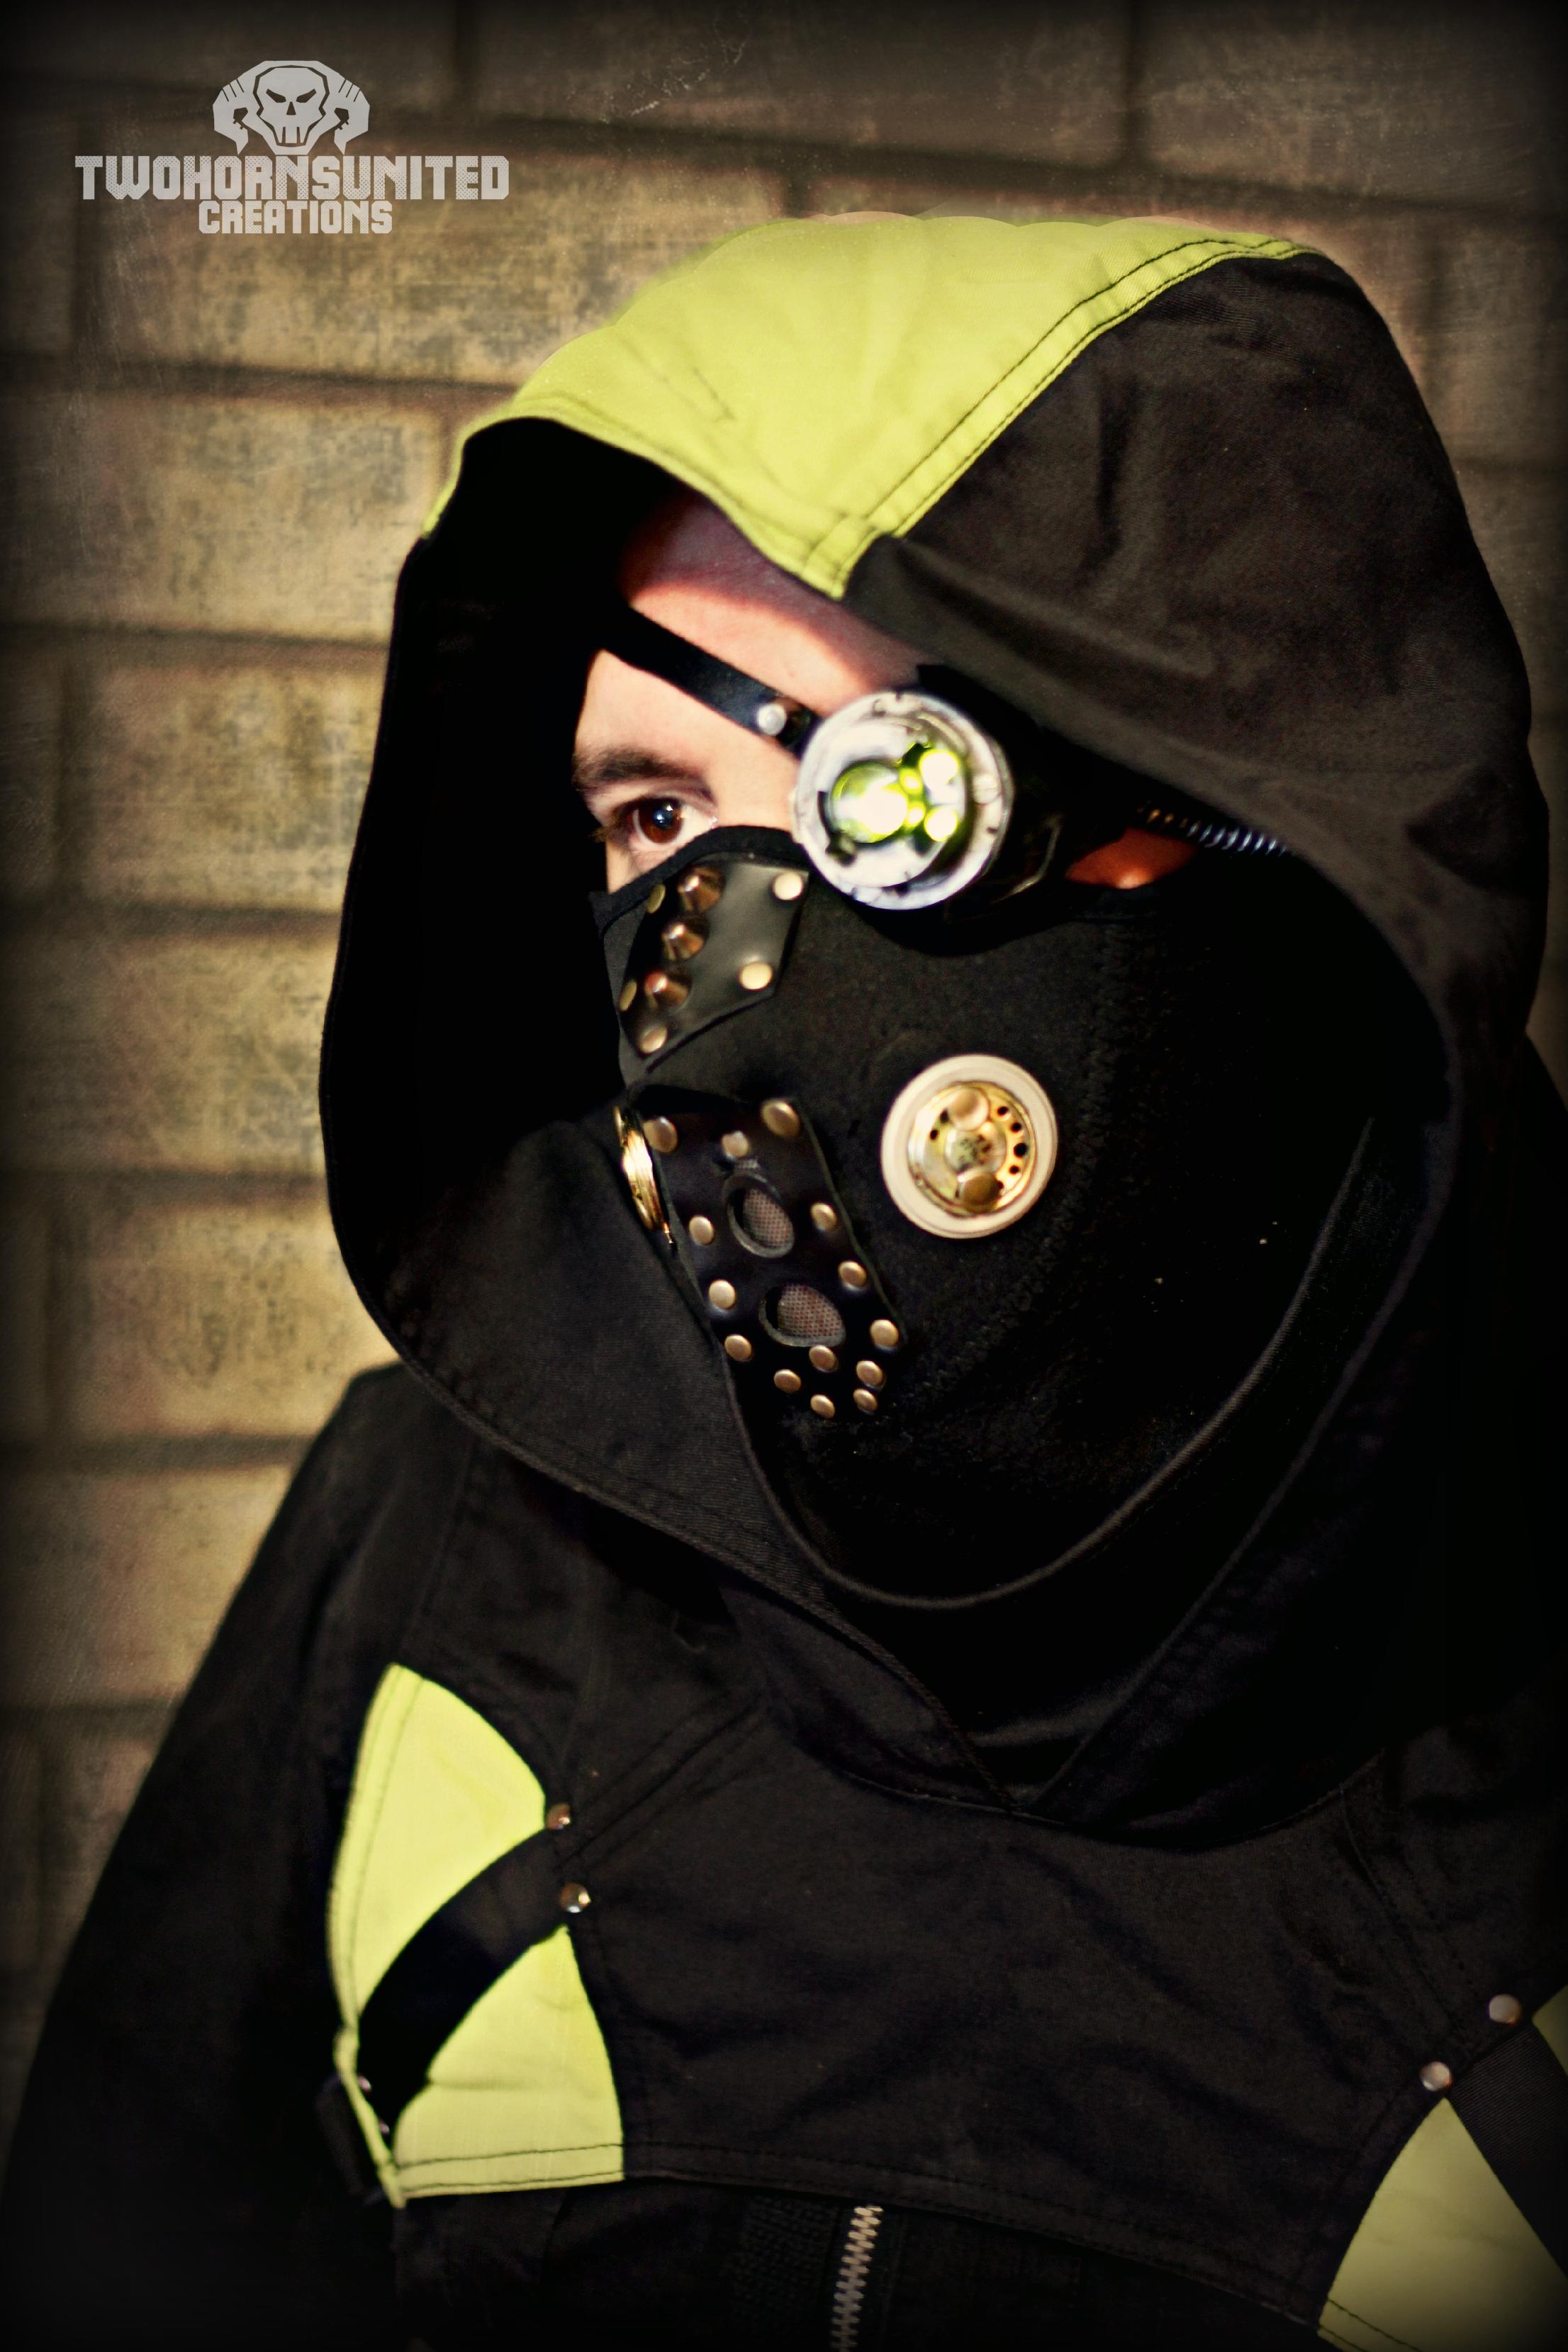 Digital Hedonist Cyberpunk LED monocle + mask by TwoHornsUnited